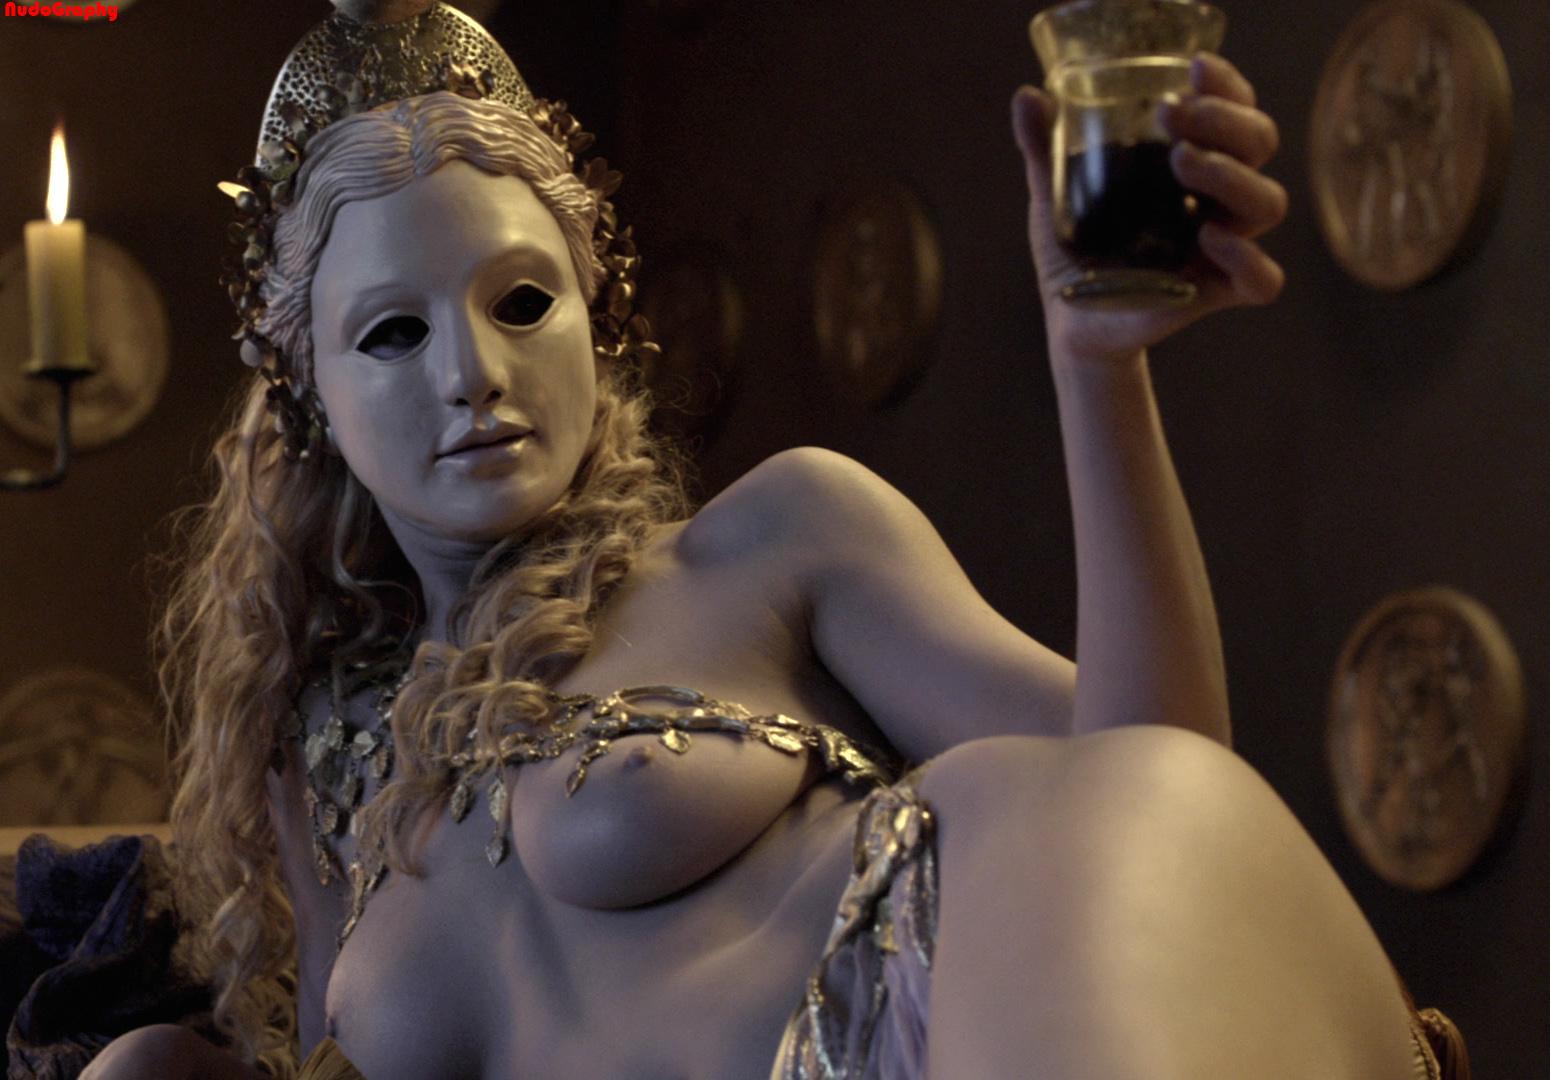 erotika-kadri-iz-filmov